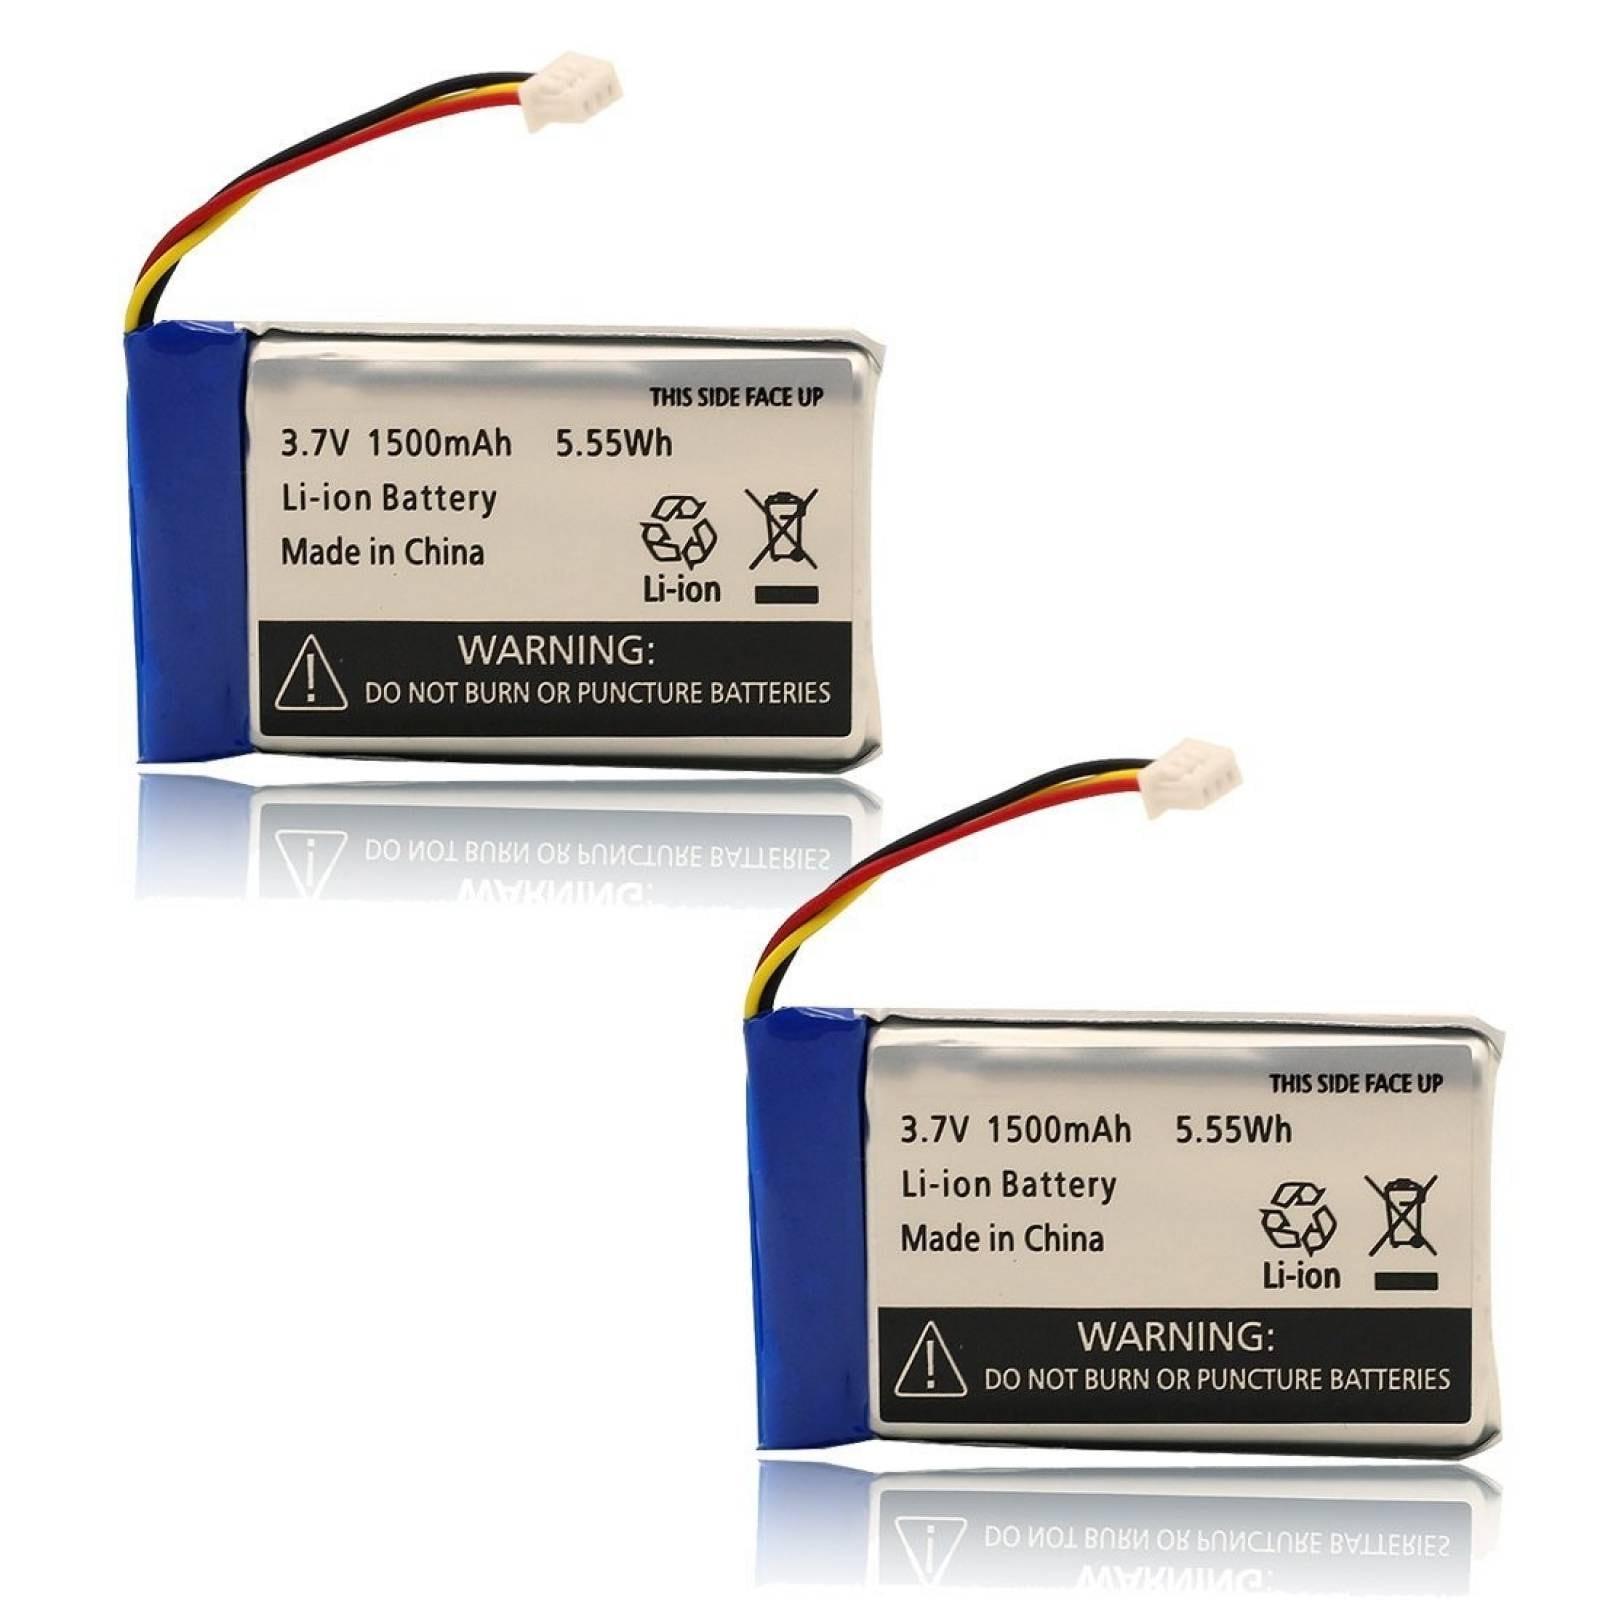 Baterías Aotu 2 Pack Para Monitor Bebé Infant Optics Dxr-8